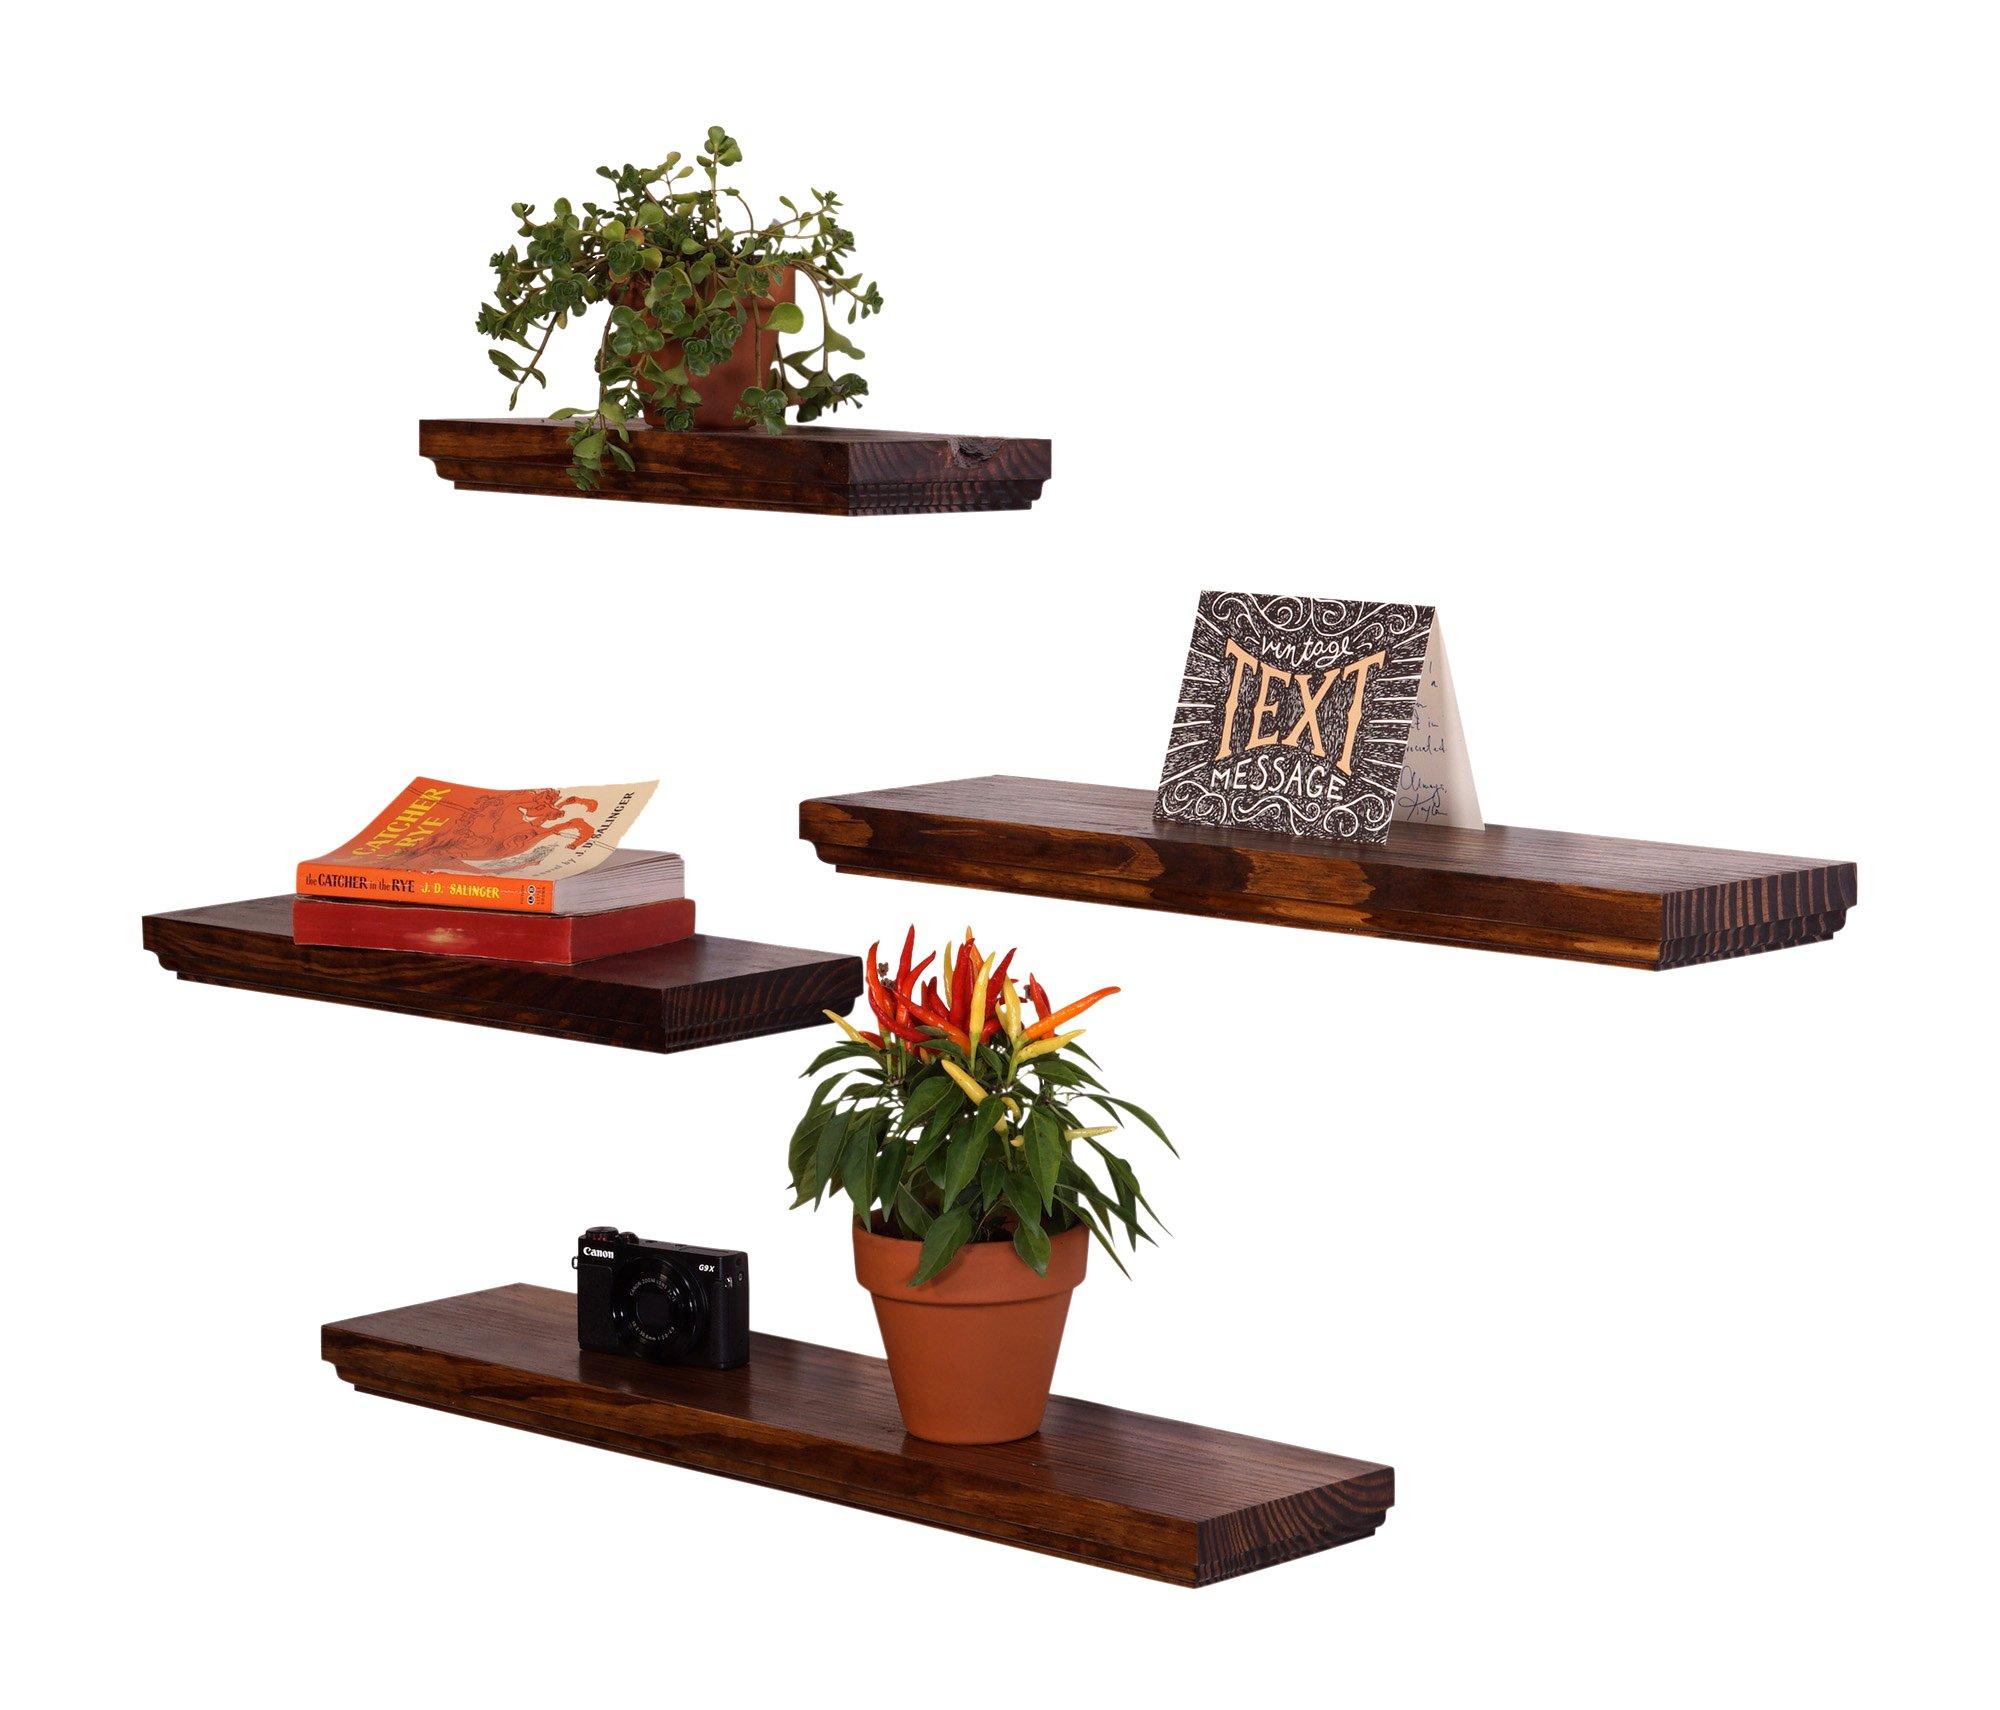 DAKODA LOVE Routed Edge Floating Shelves, USA Handmade, Clear Coat Finish, 100% Countersunk Hidden Floating Shelf Brackets, Beautiful Grain Pine Wood Wall Decor (Set of 4) (Bourbon) by DAKODA LOVE (Image #2)